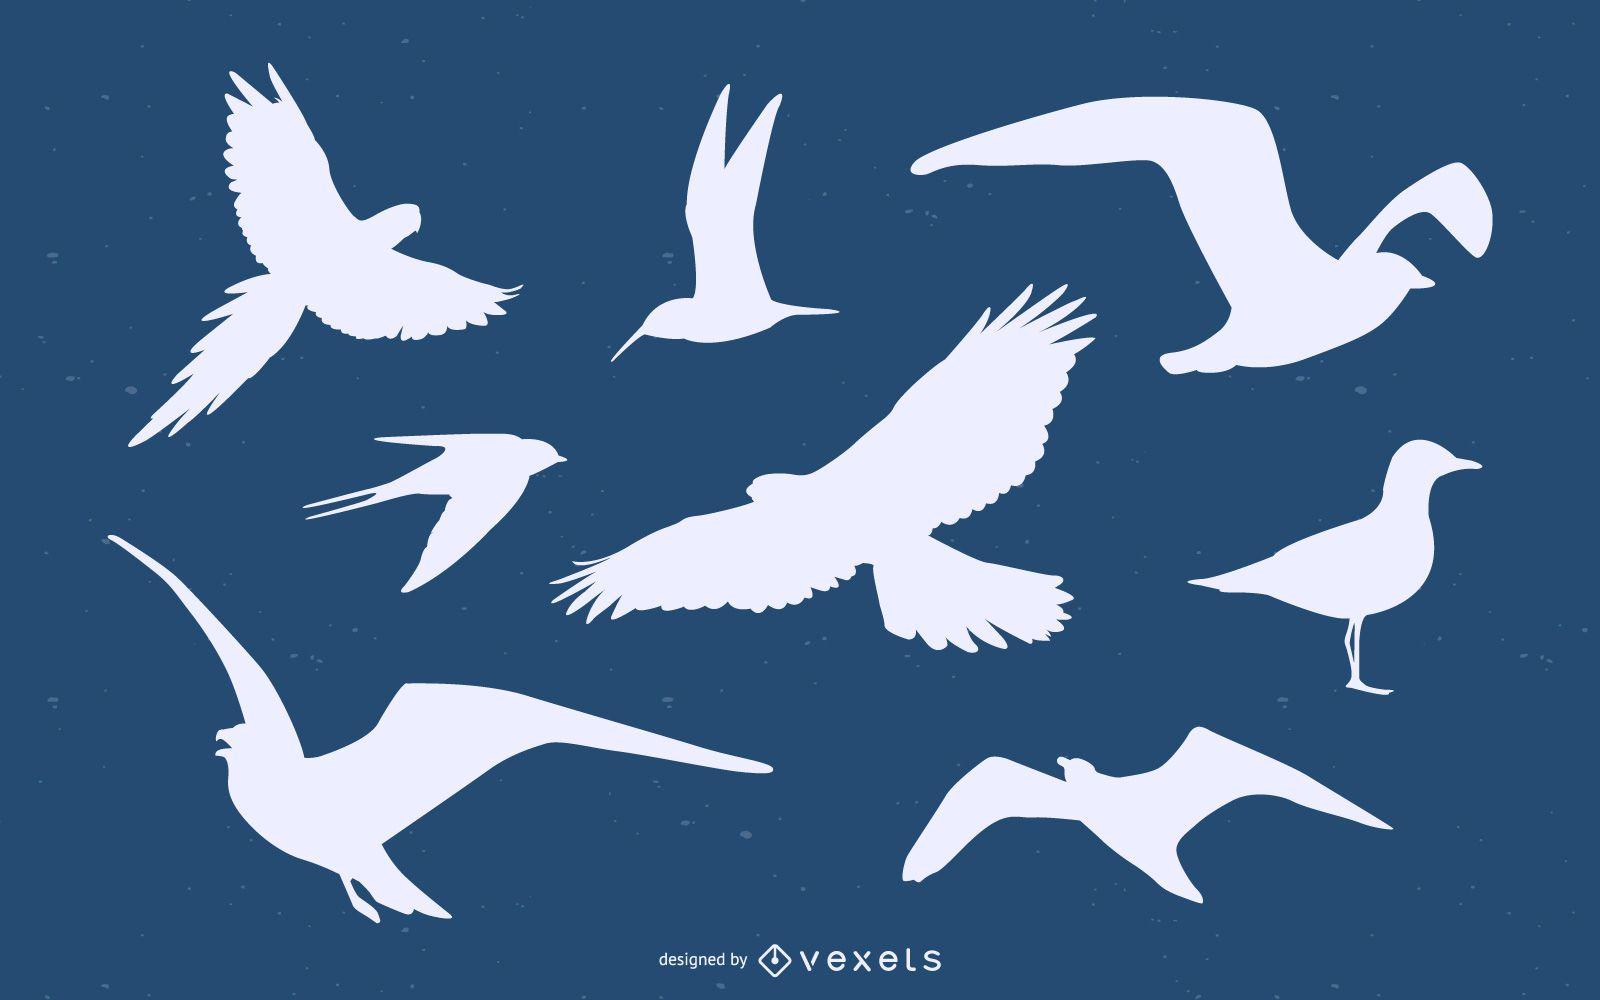 Bird Silhouette Pack